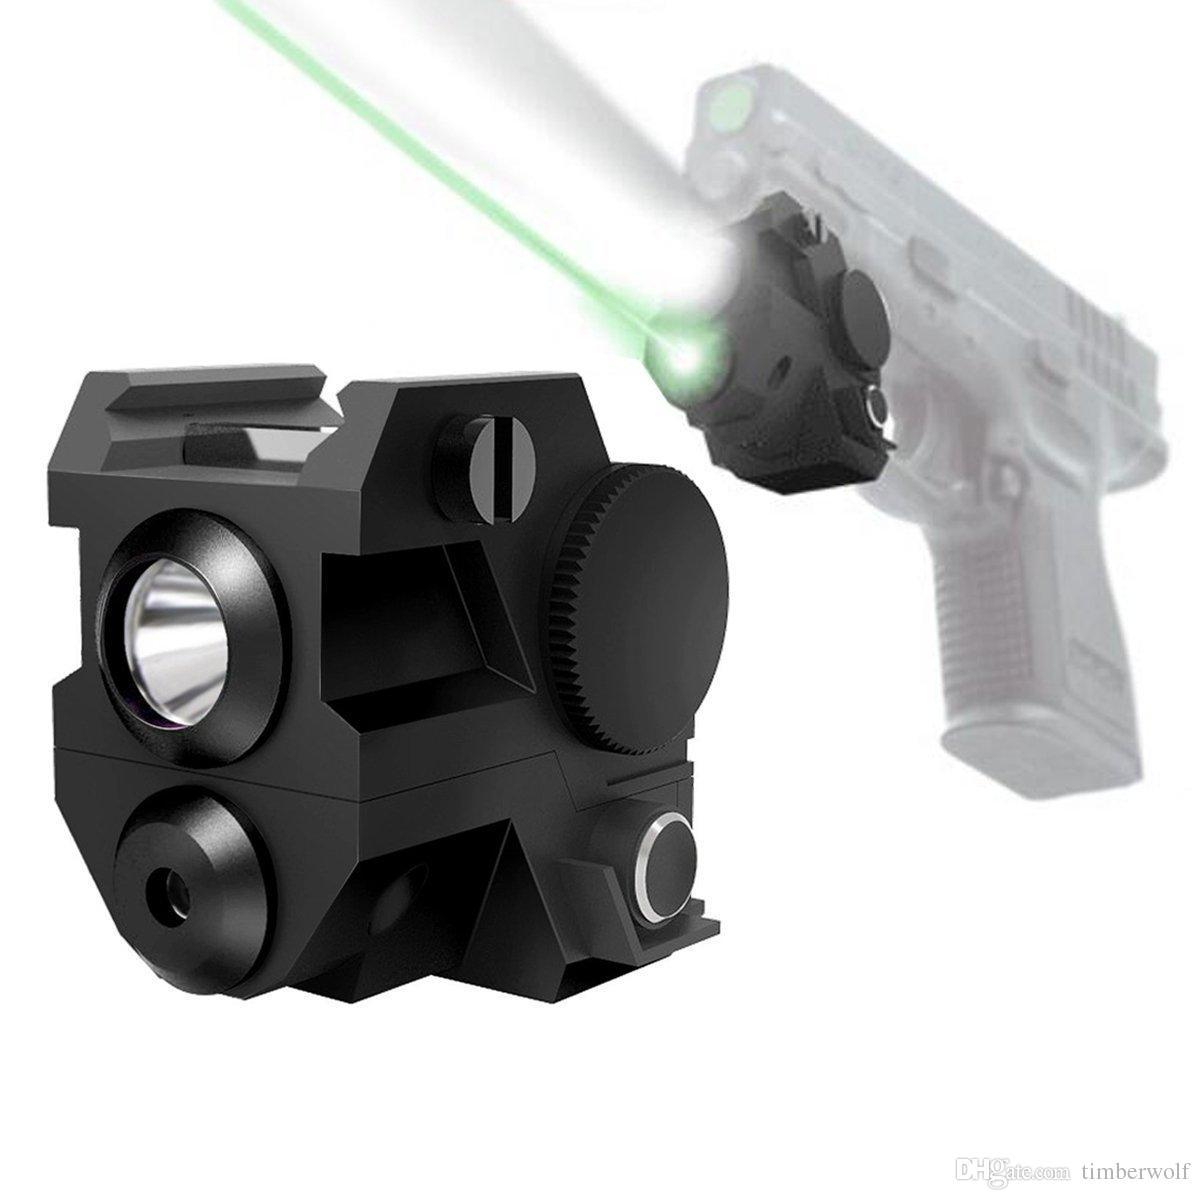 Mini laser de pistola tático Sub Compact Laser Sight com trilho de montagem  alta Lumen CREE LED lanterna de luz integrado Combo com Strobe